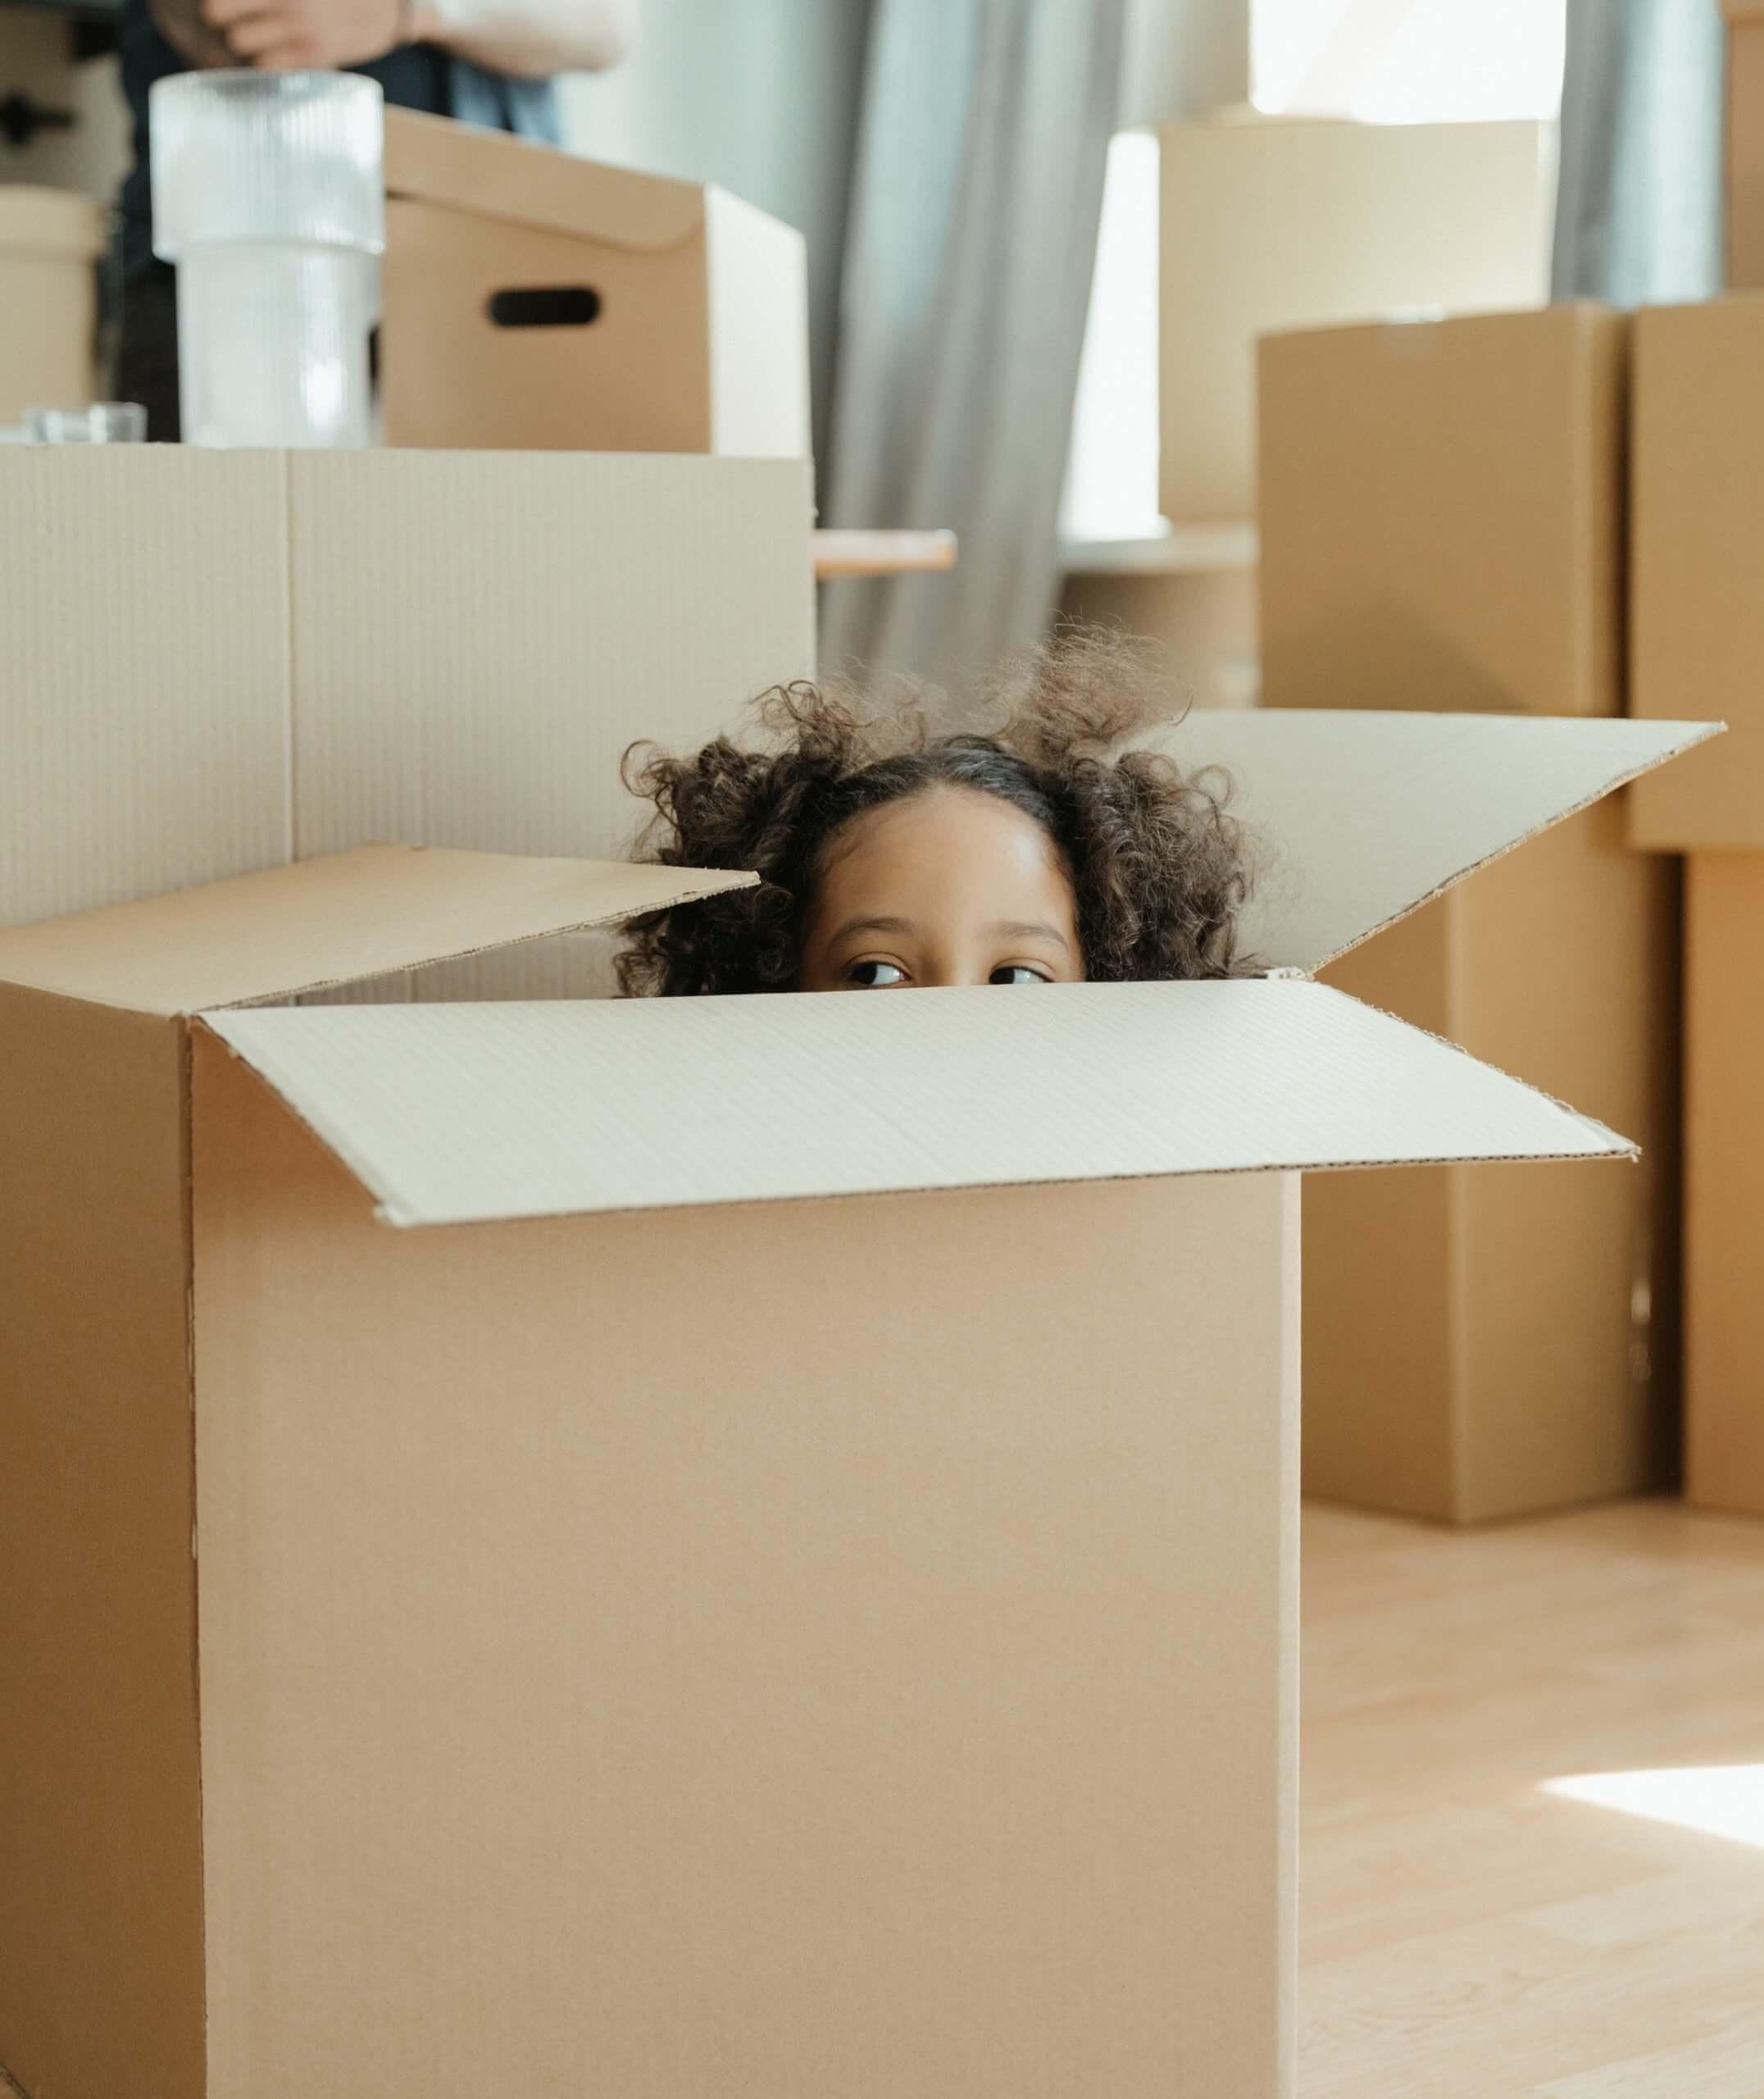 Kid Inside The Box